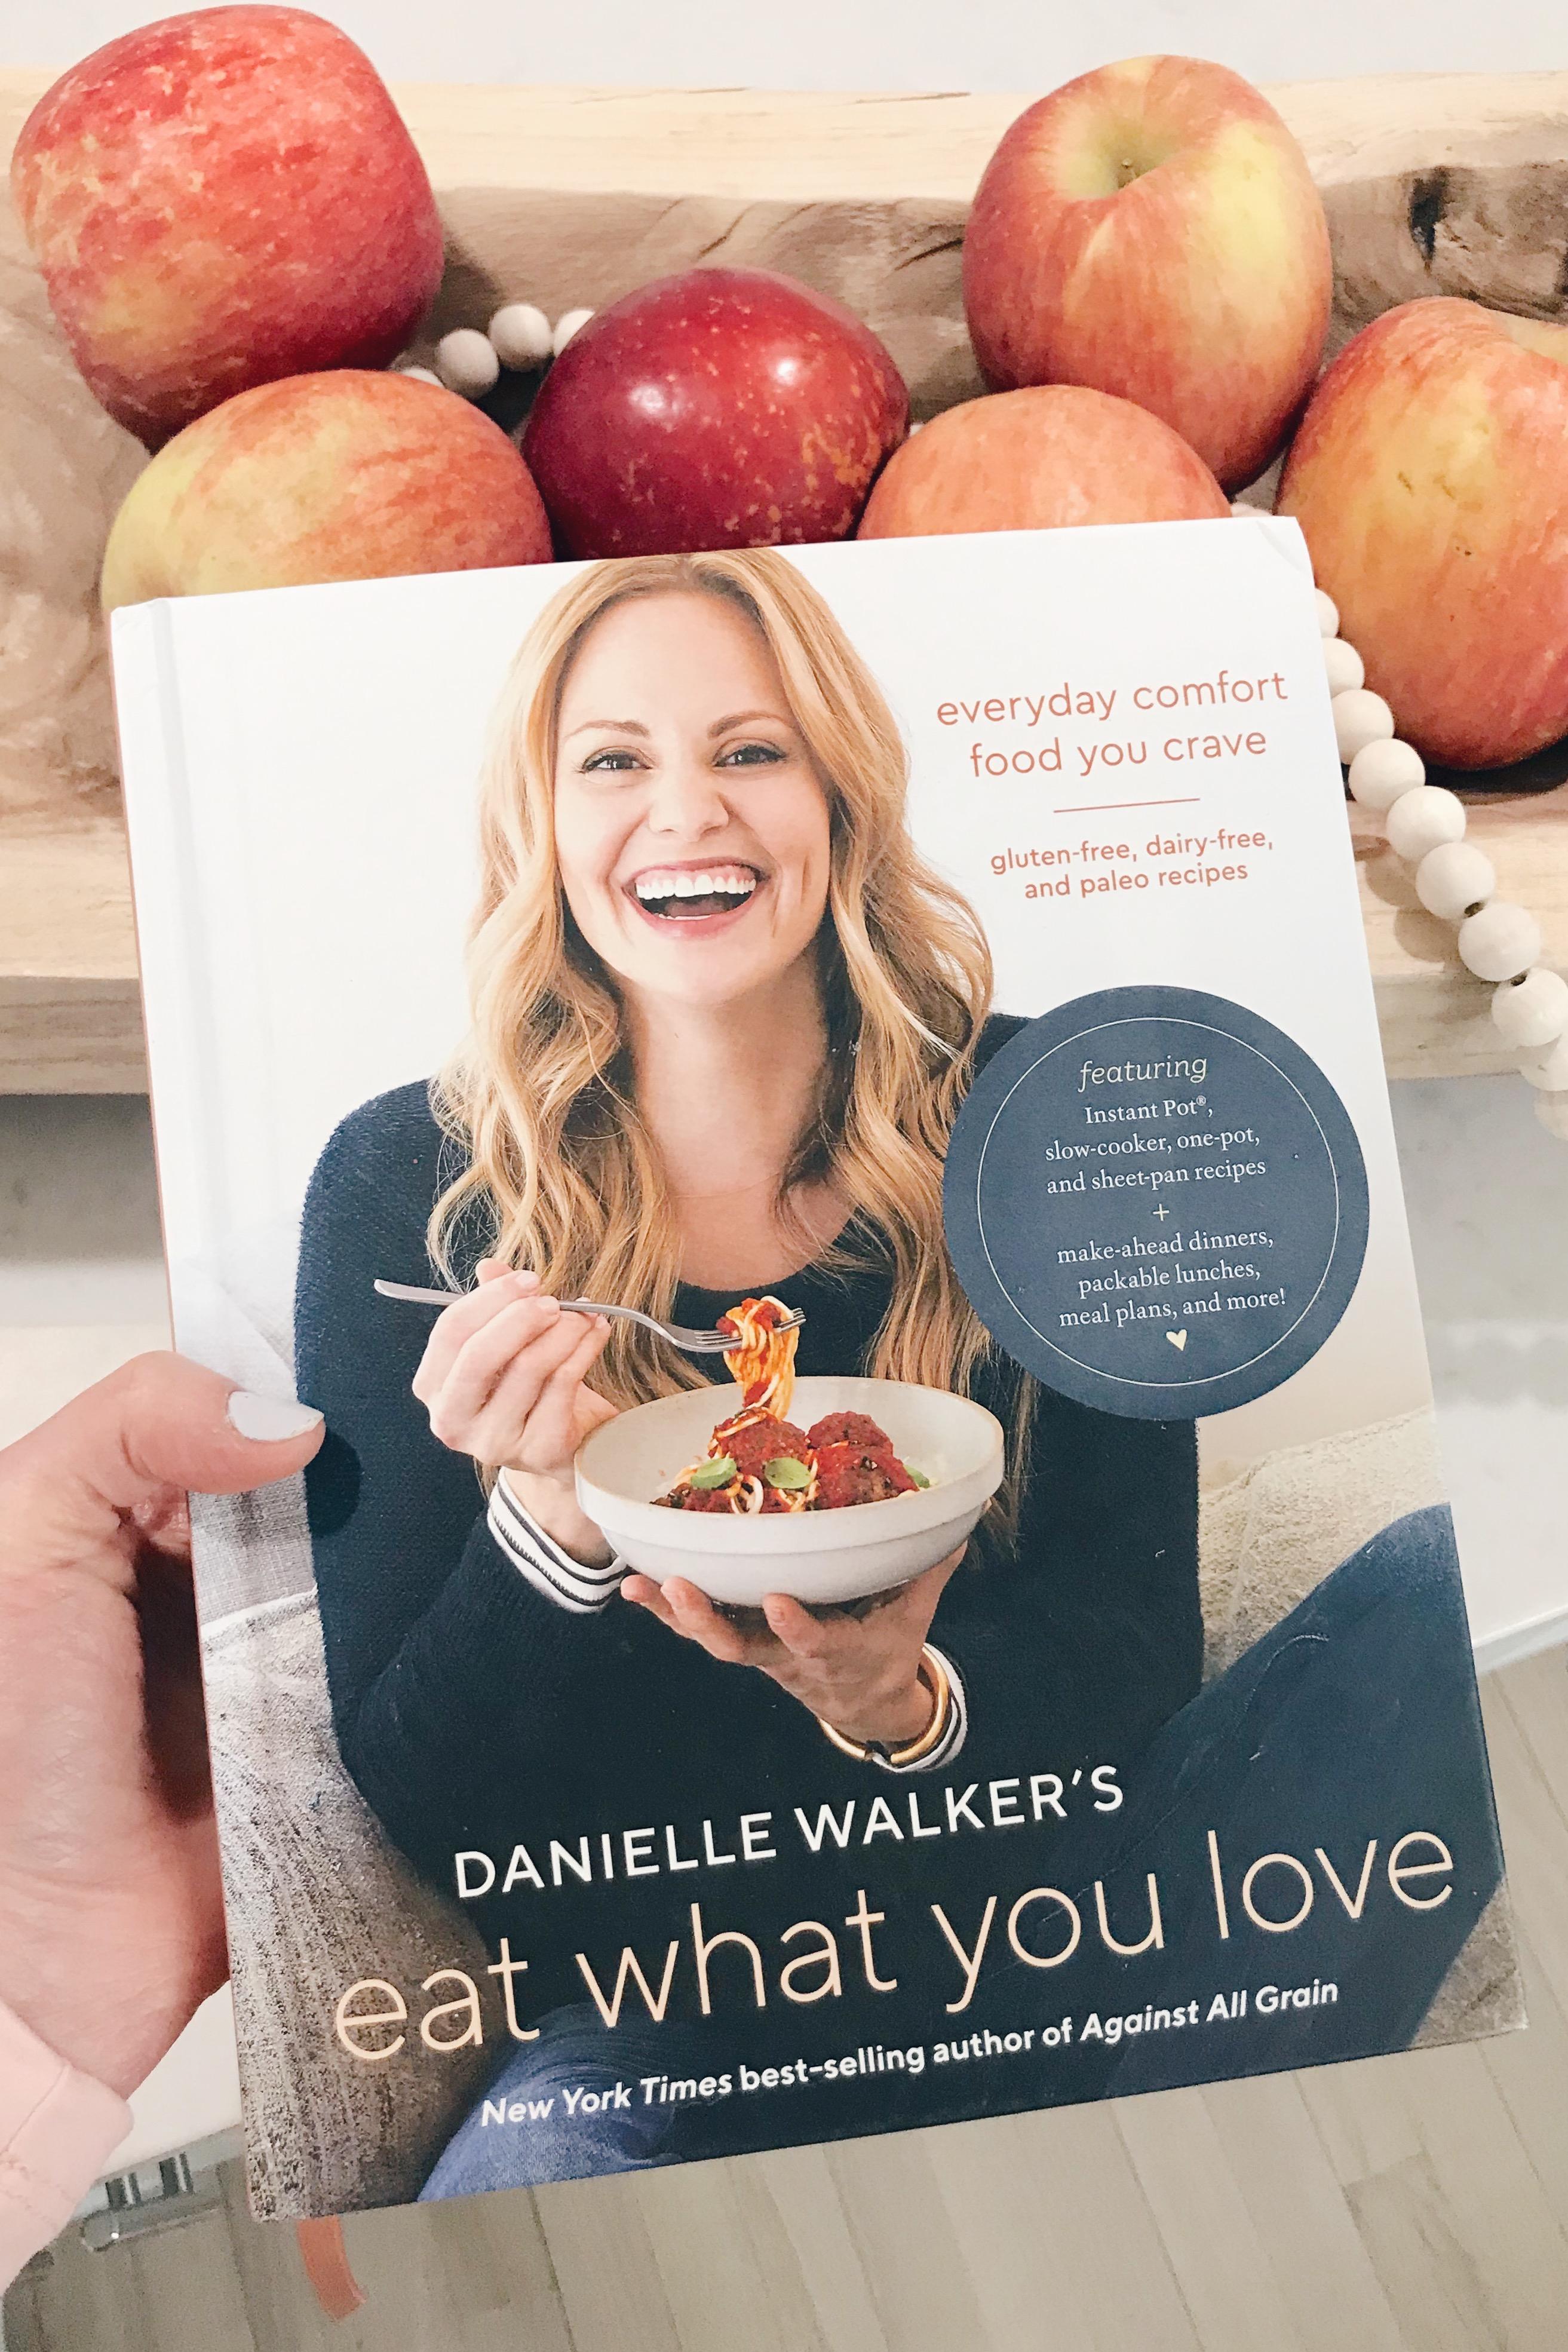 healthy dinner recipes on pinteresting plans blog - danielle walker's book - favorite recipes